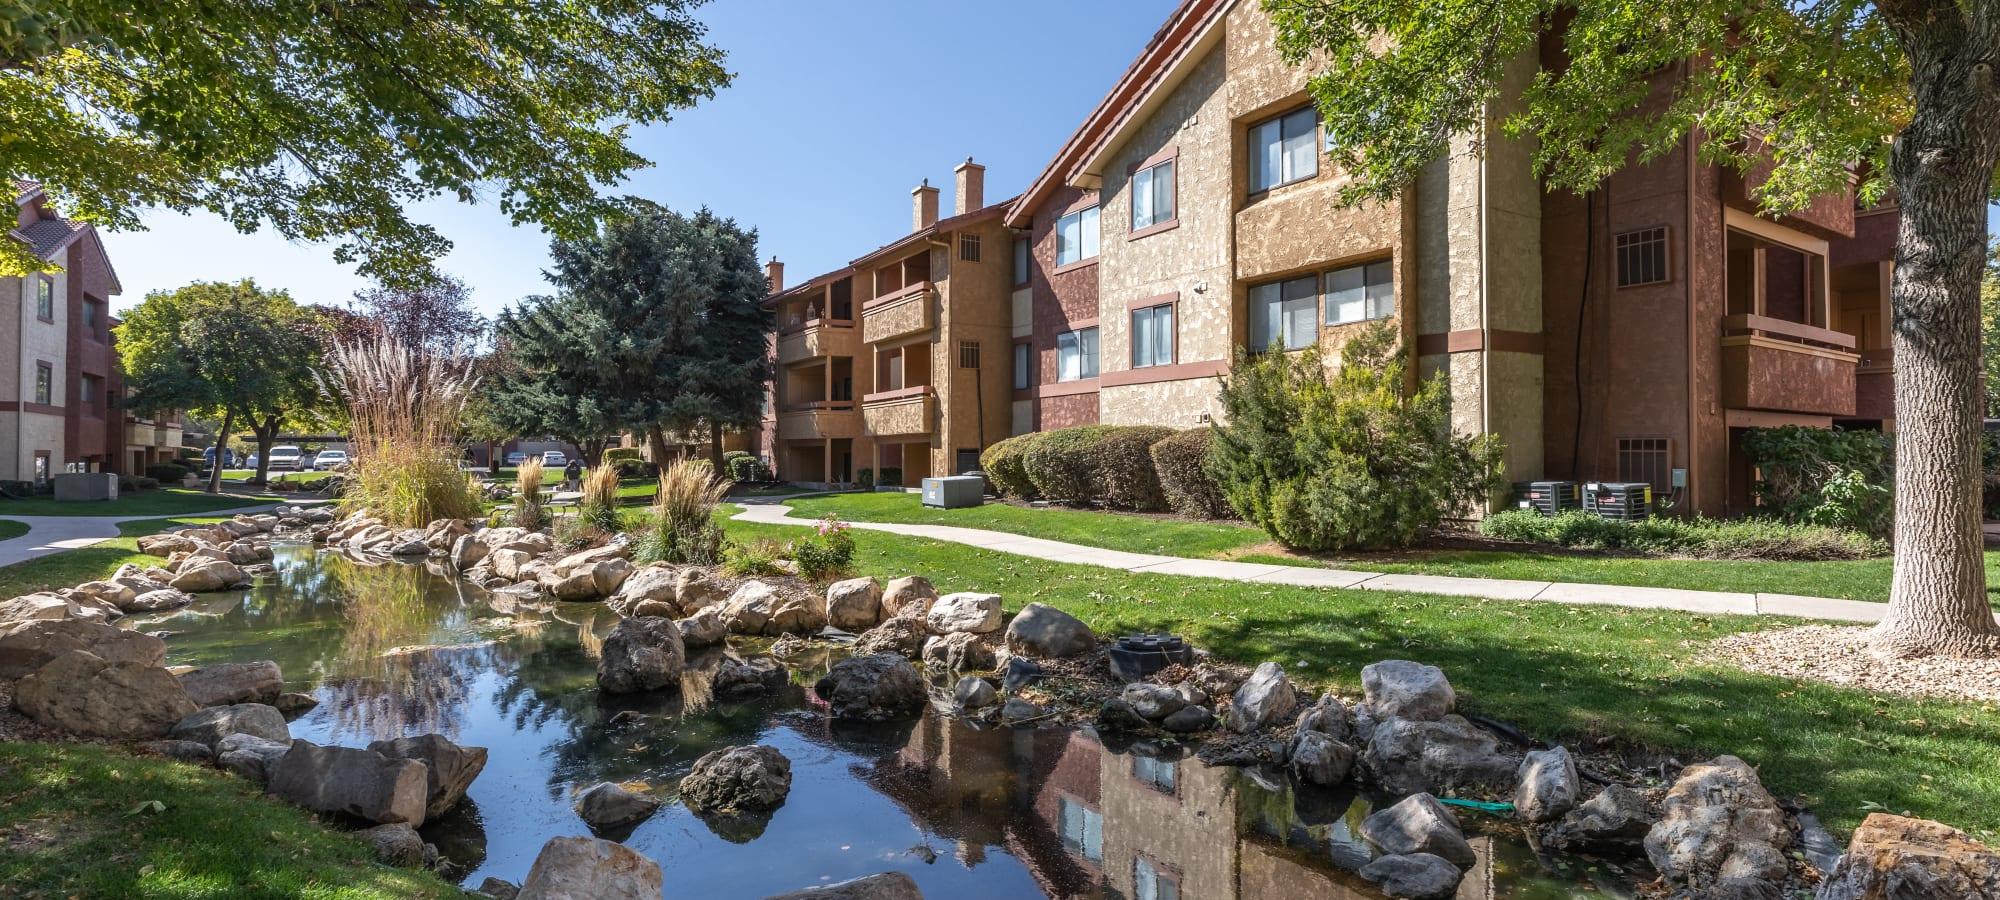 Shadowbrook Apartments in West Valley City, Utah